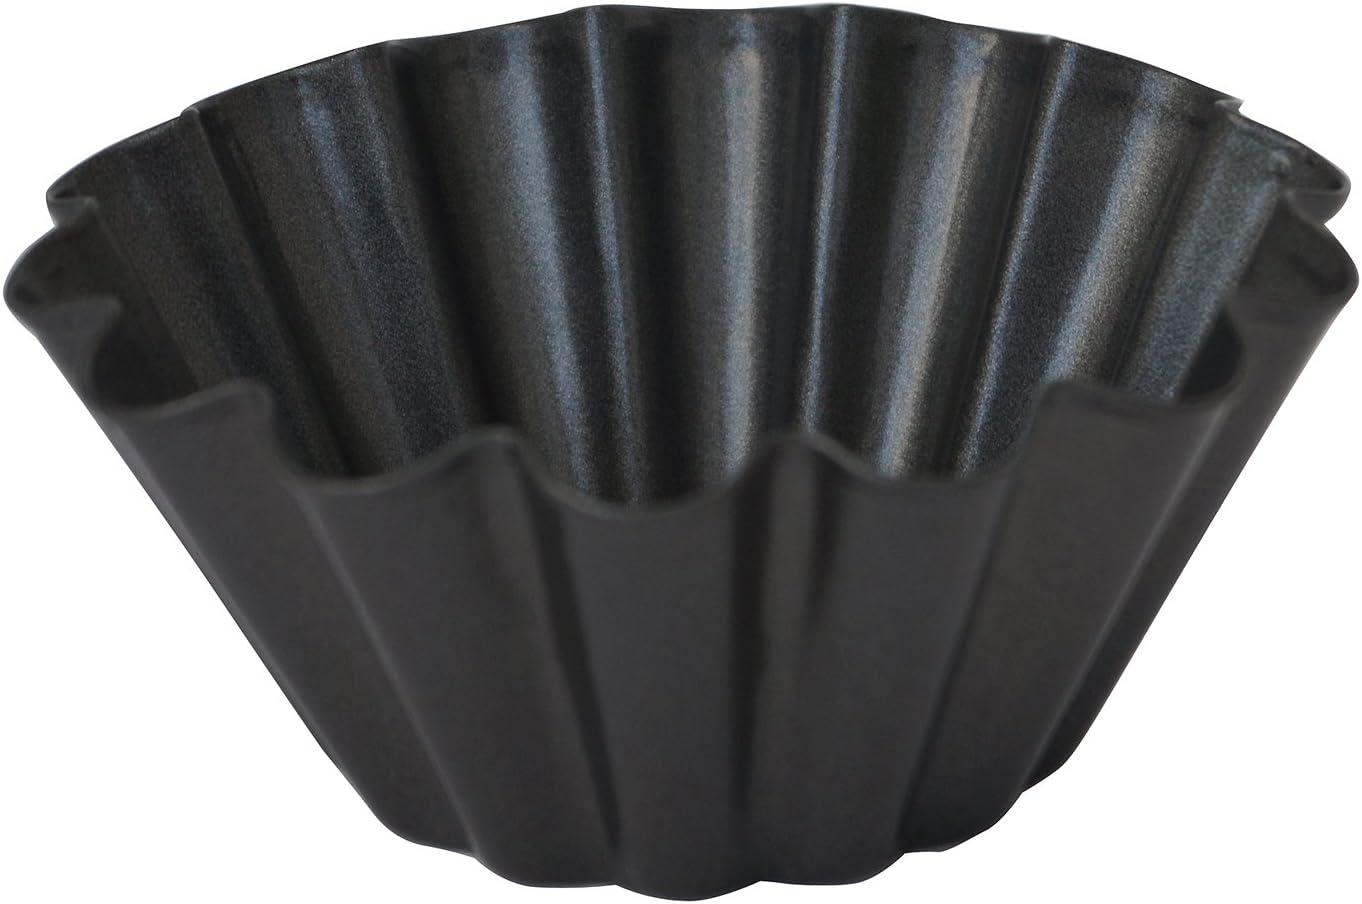 DE BUYER 4702,10 Mini Brioche 10 cm Anti-adherente 14 cm